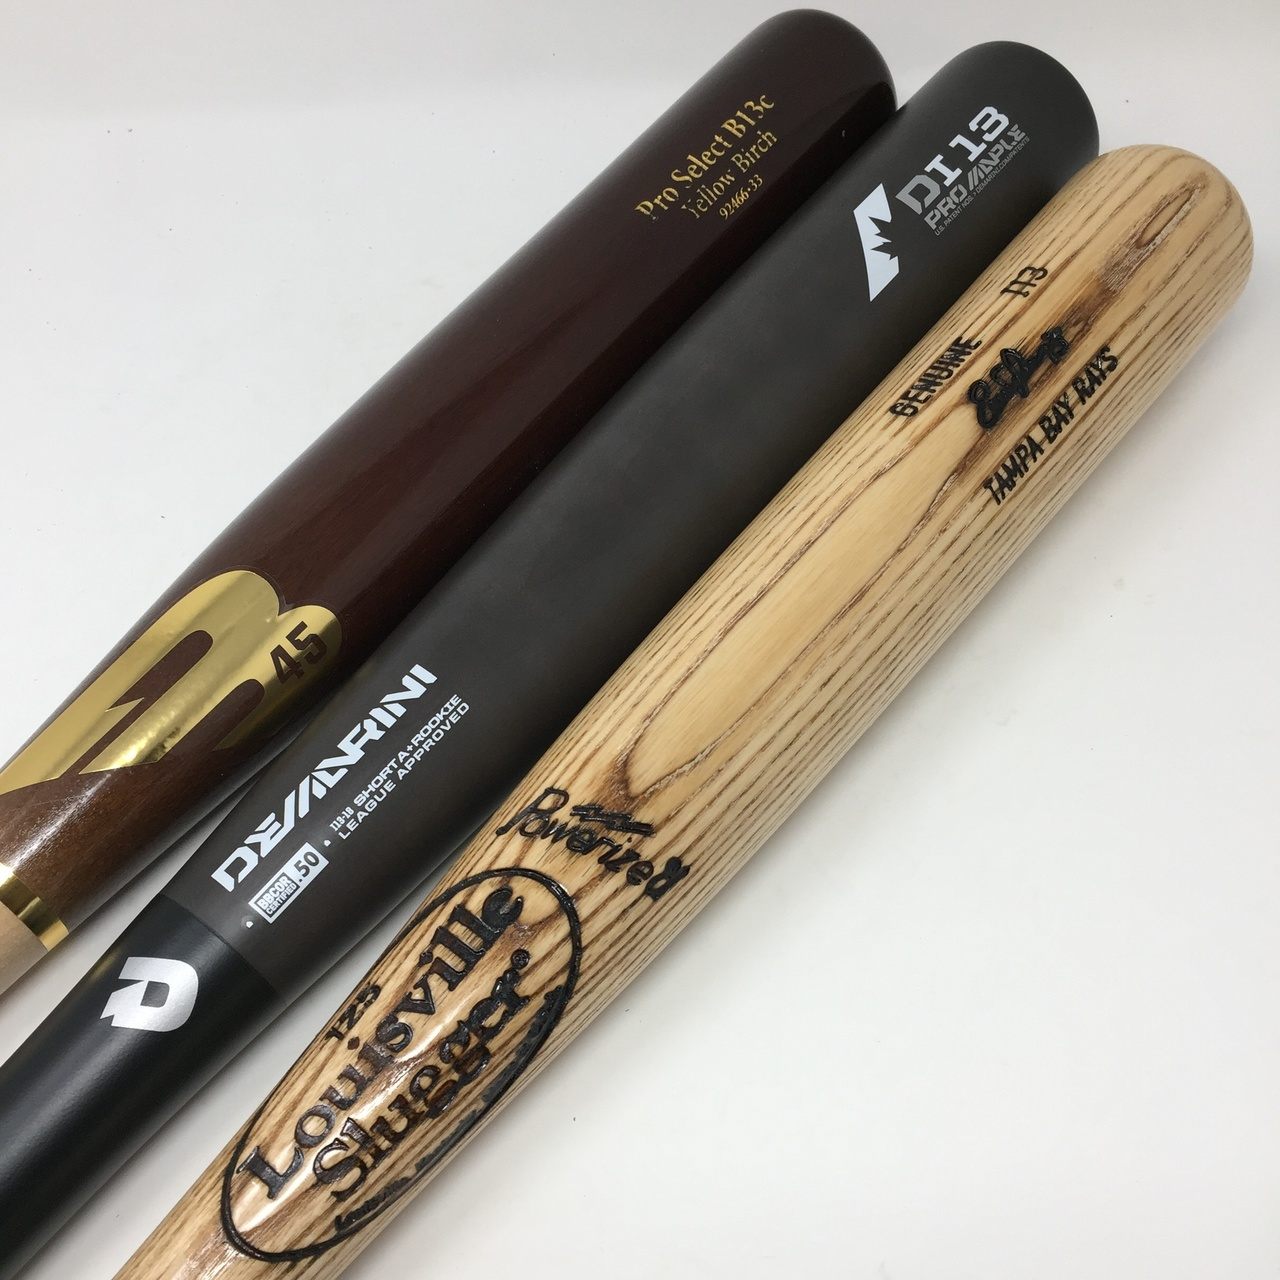 bat-pack-3-bats-i13-turning-model-33-inch-b45-birch-demarini-composite-louisville-slugger-i13-ash BATPACK-0006   1. GI13EL-33/30 Louisville Slugger MLB Evan Longoria Ash Adult Baseball Bat